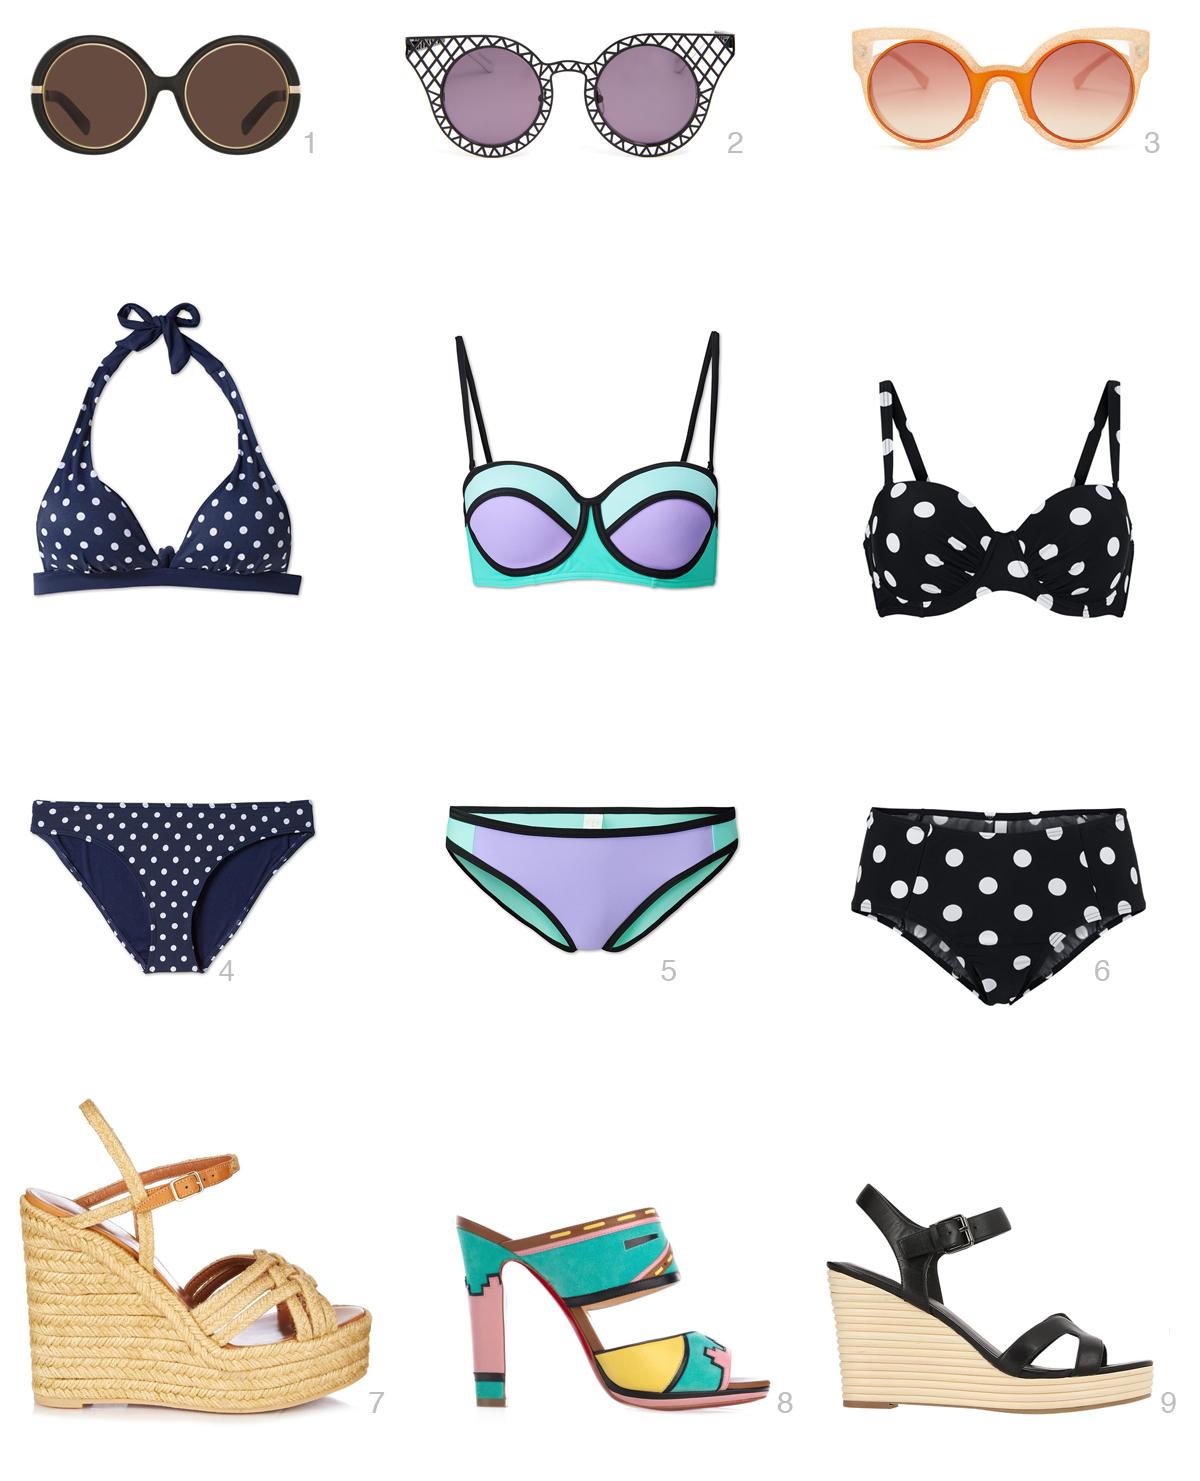 sunglasses-bikini-espadrilles-tenue-de-plage-estivale-justemagazine-beachwear